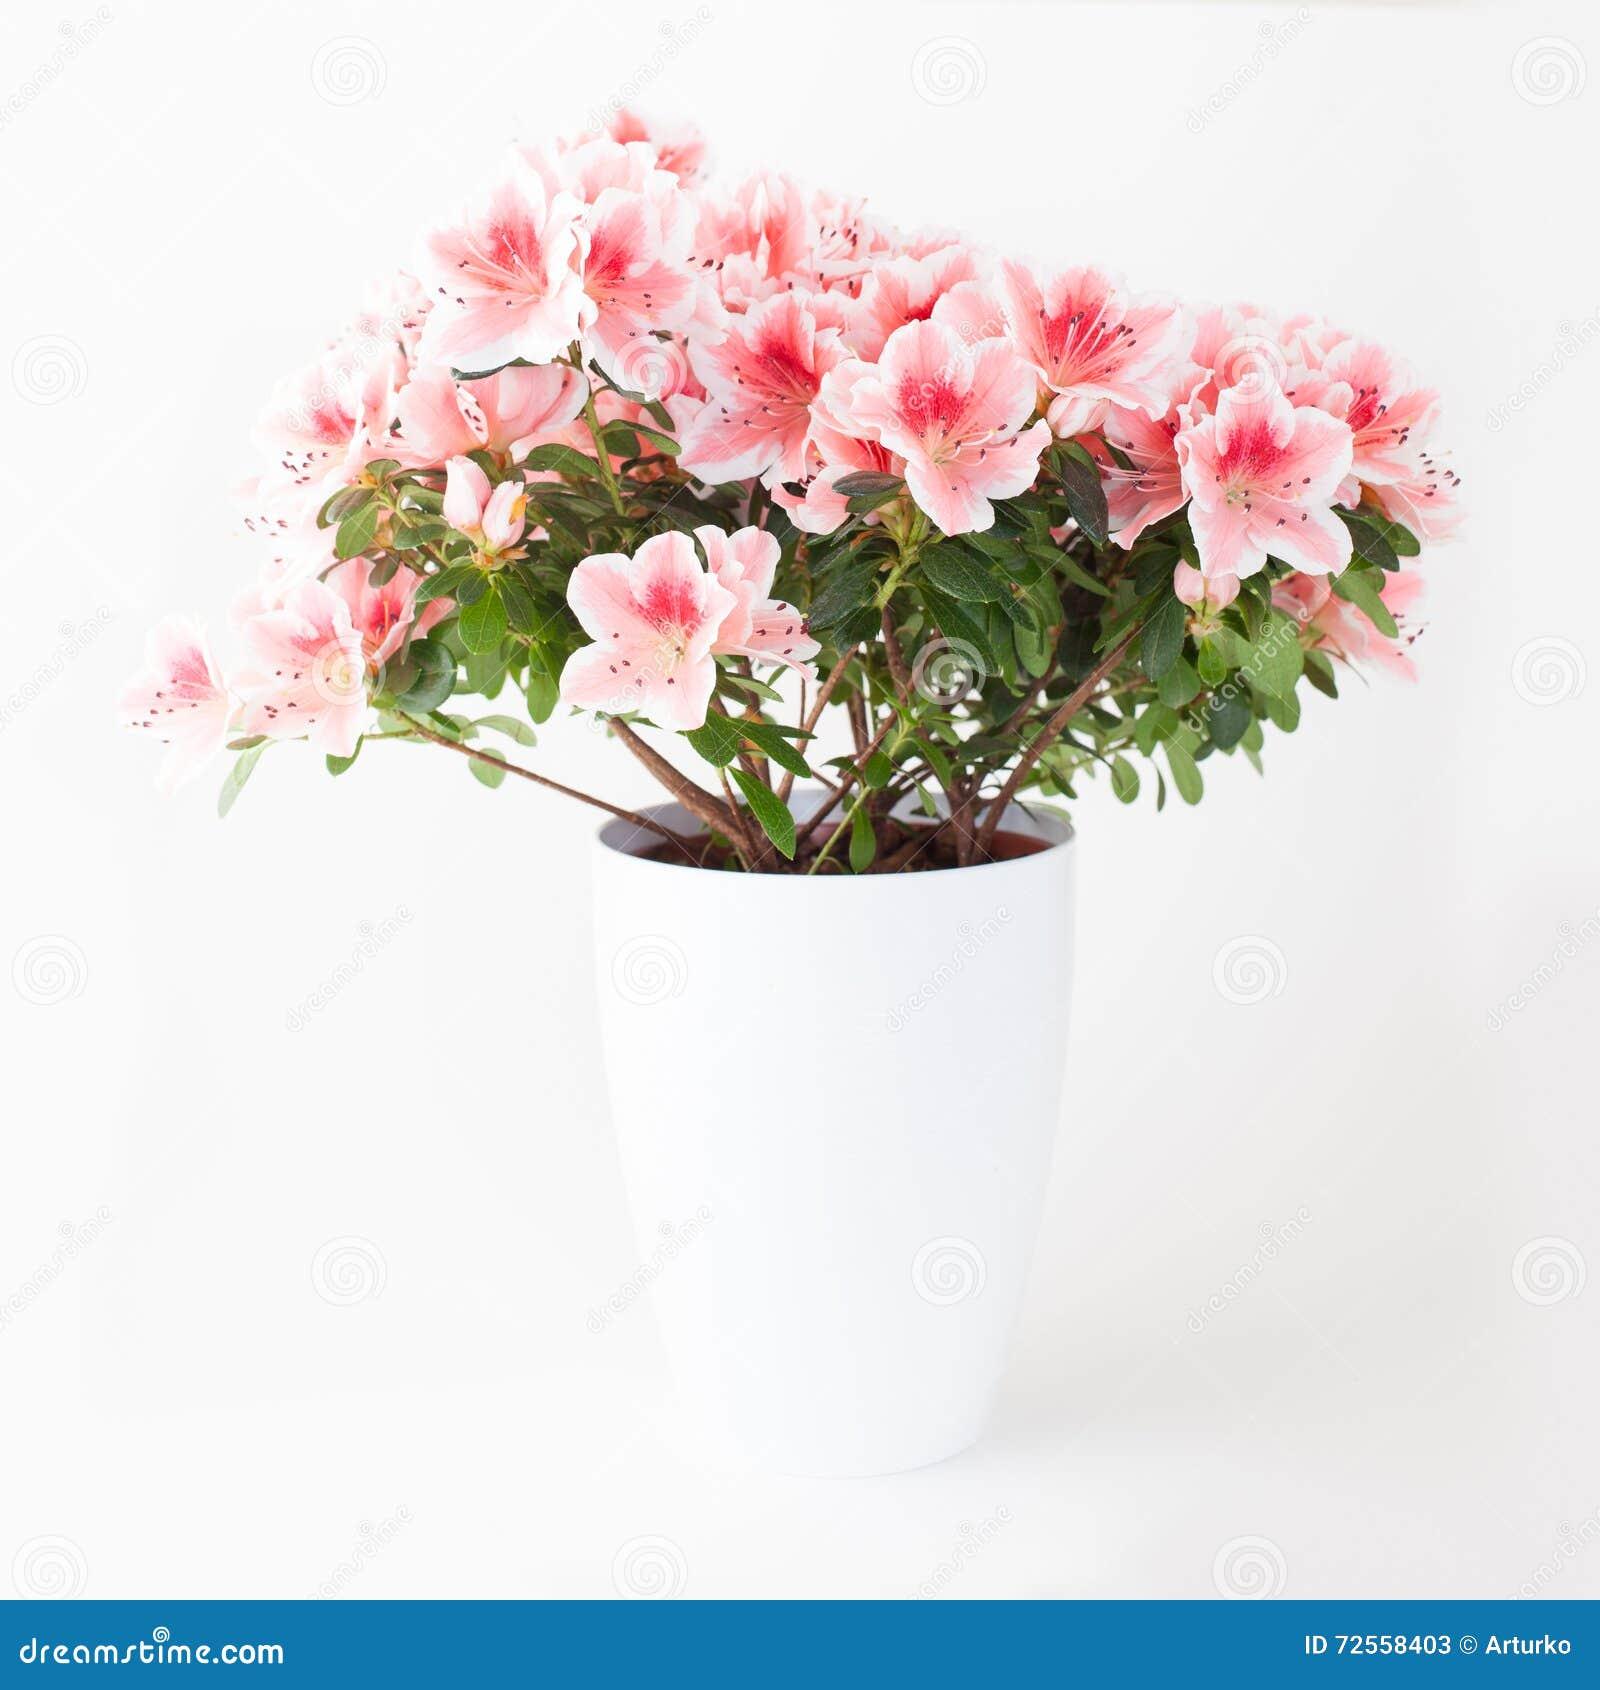 Pink and white azalea flower plant stock image image of azalea pink and white azalea flower plant mightylinksfo